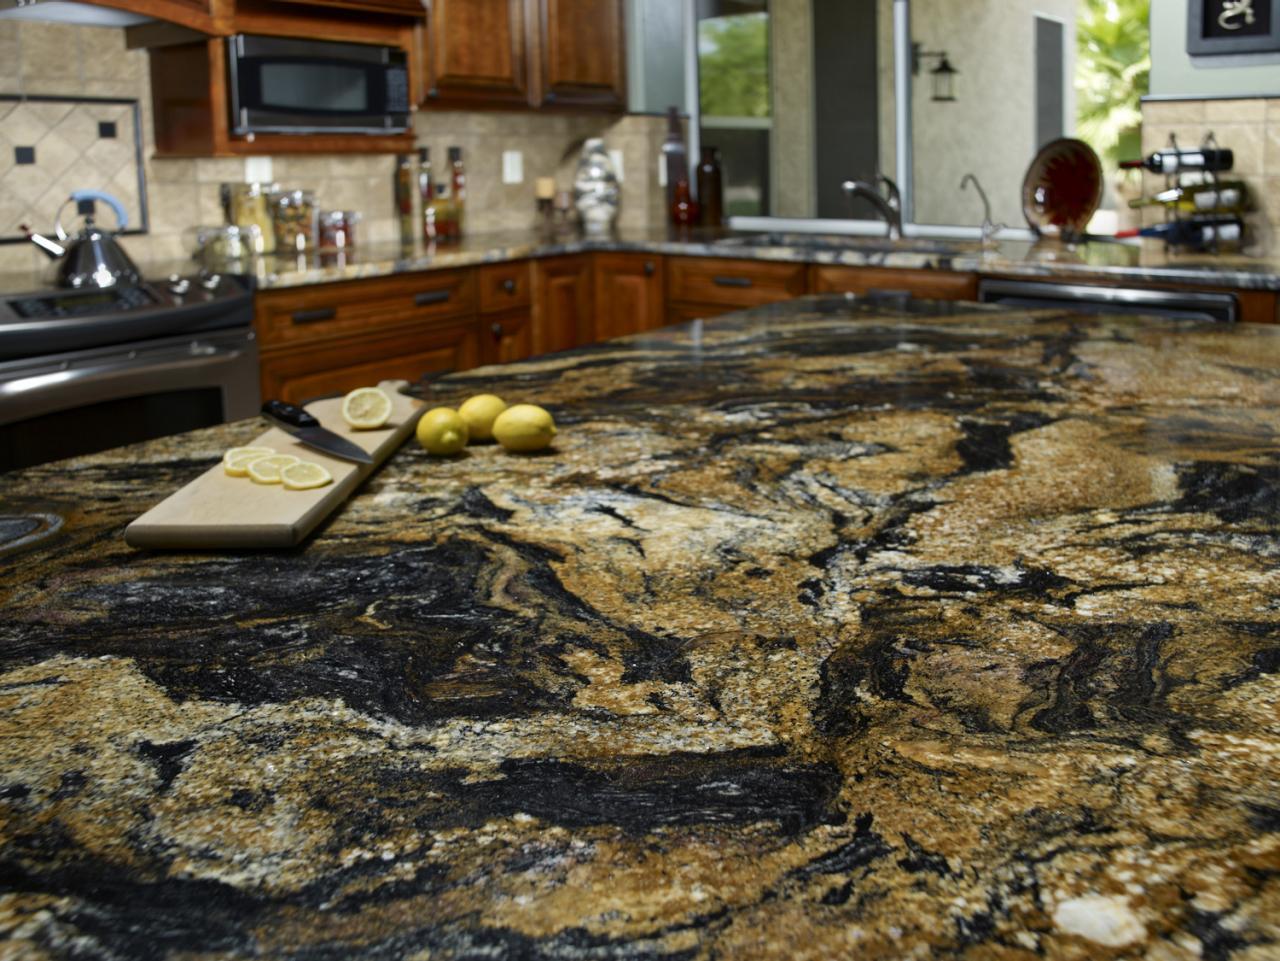 granite kitchen counter pictures photo - 4